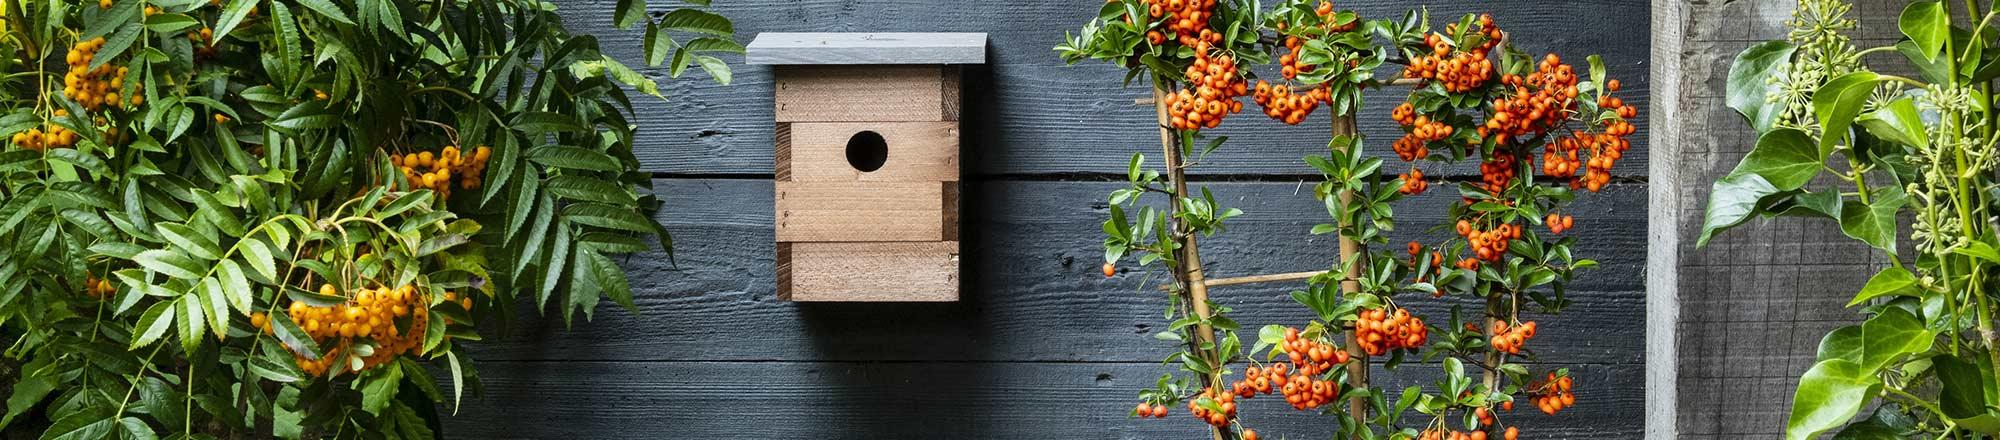 Vogelhuisje of nestkastje in de tuin